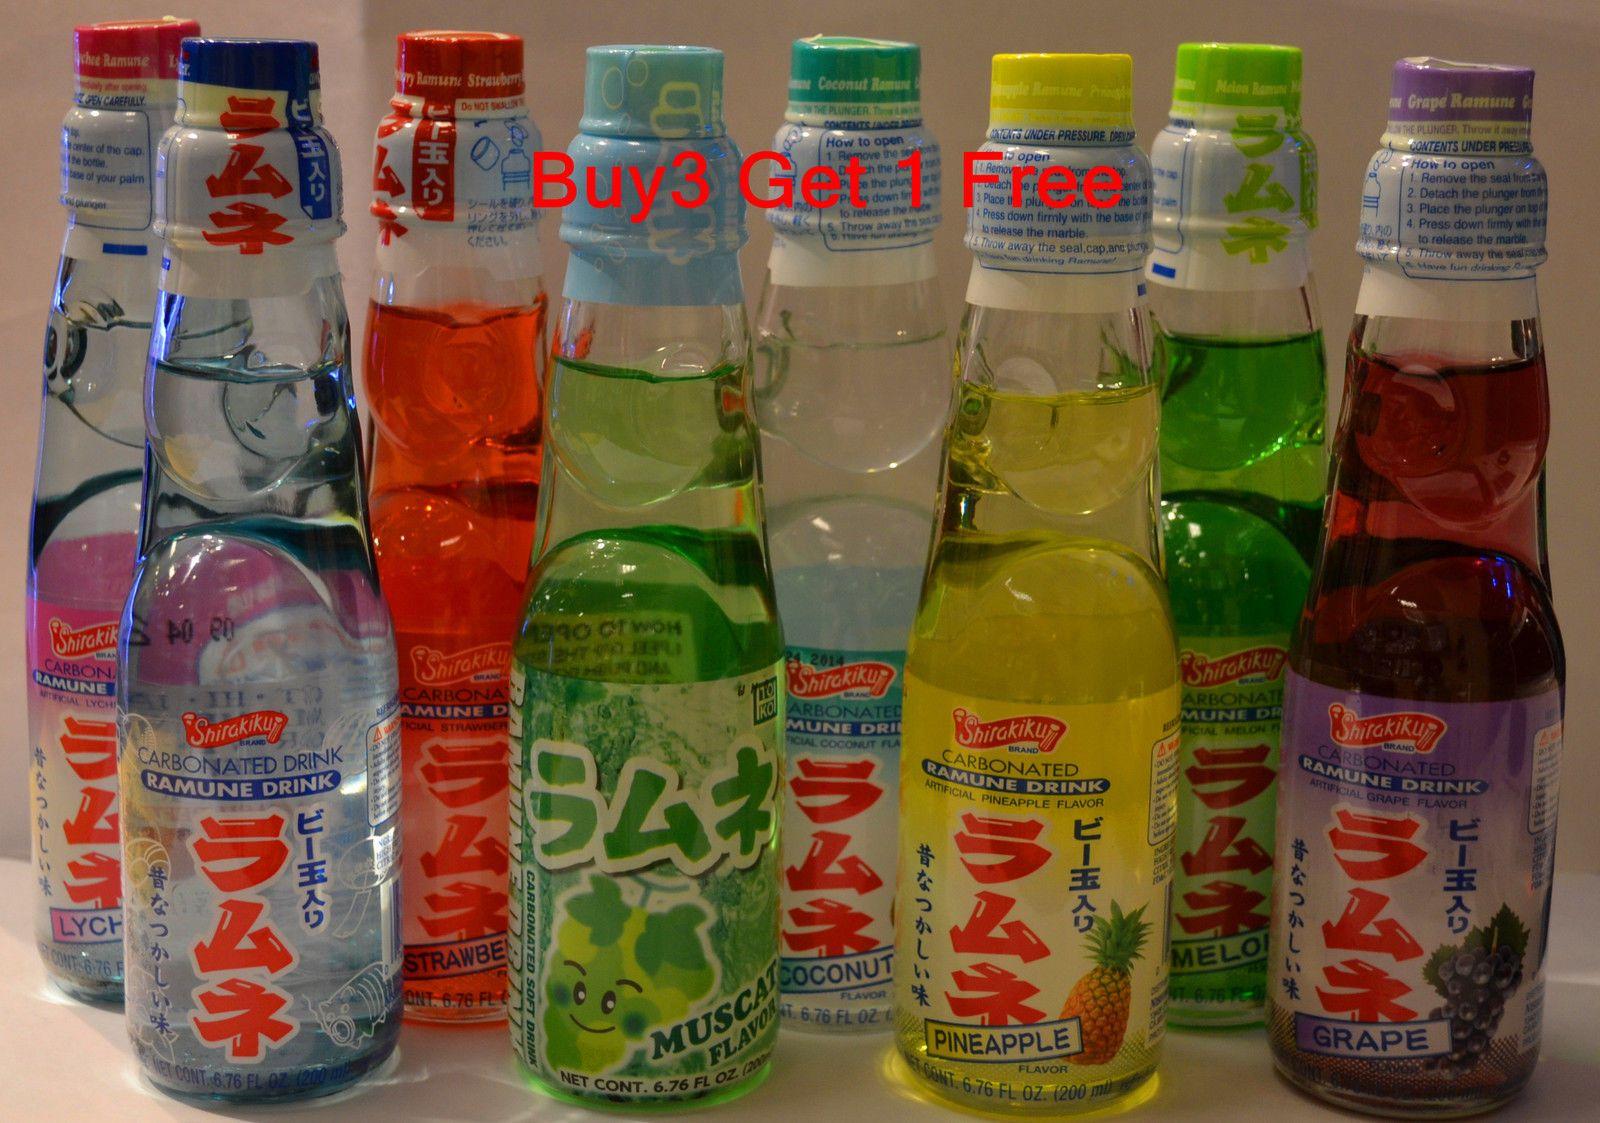 Ramune Japanese Soda 6 76 Oz Carbonate Marble Soft Drink Buy 3 Get 1 Free Ebay